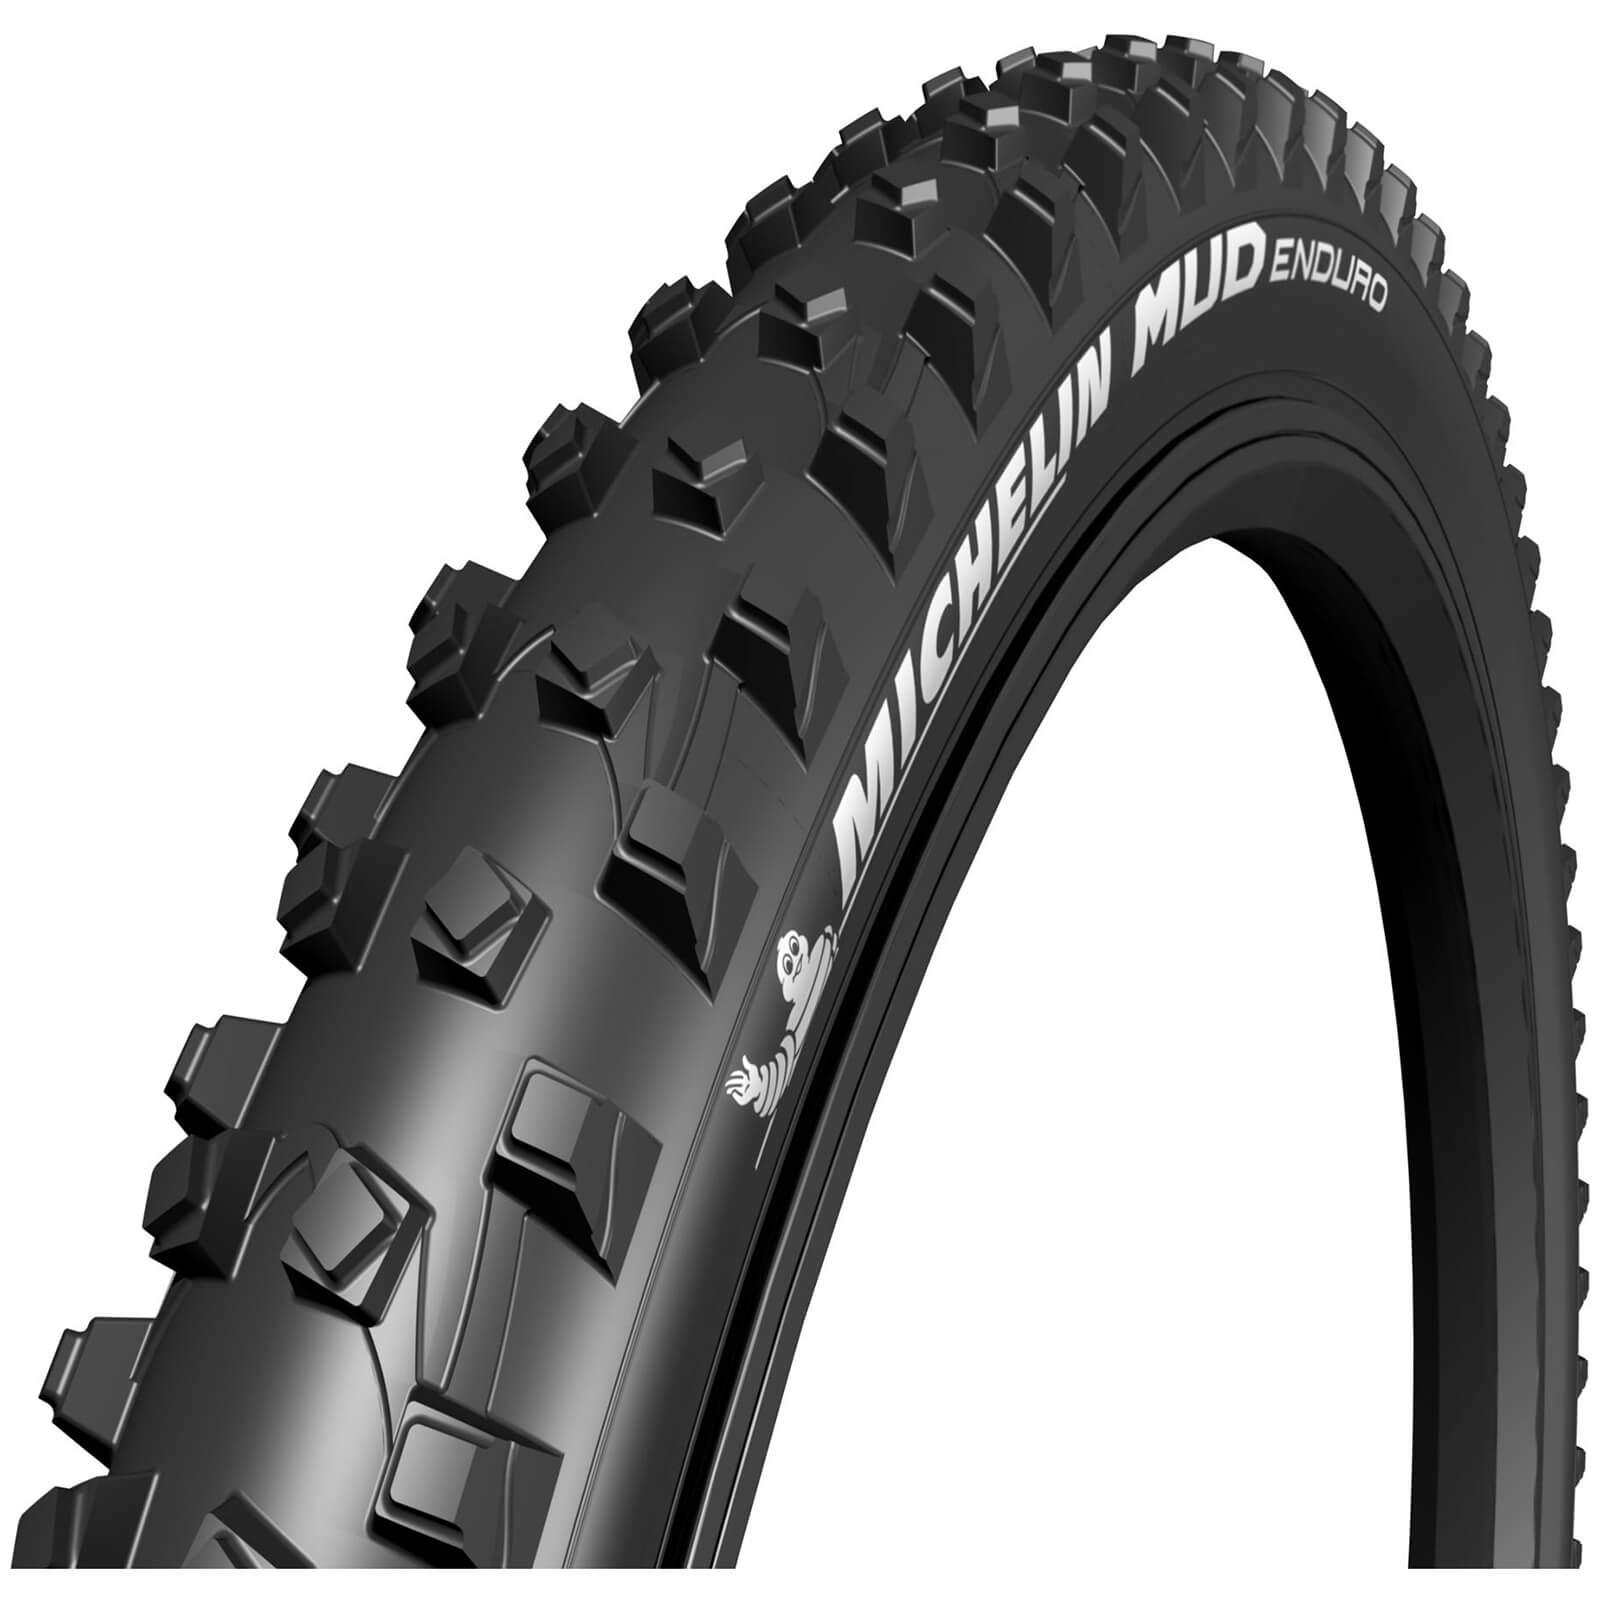 Michelin Mud ENDURO Magi-X MTB Tyre - 29x2.25